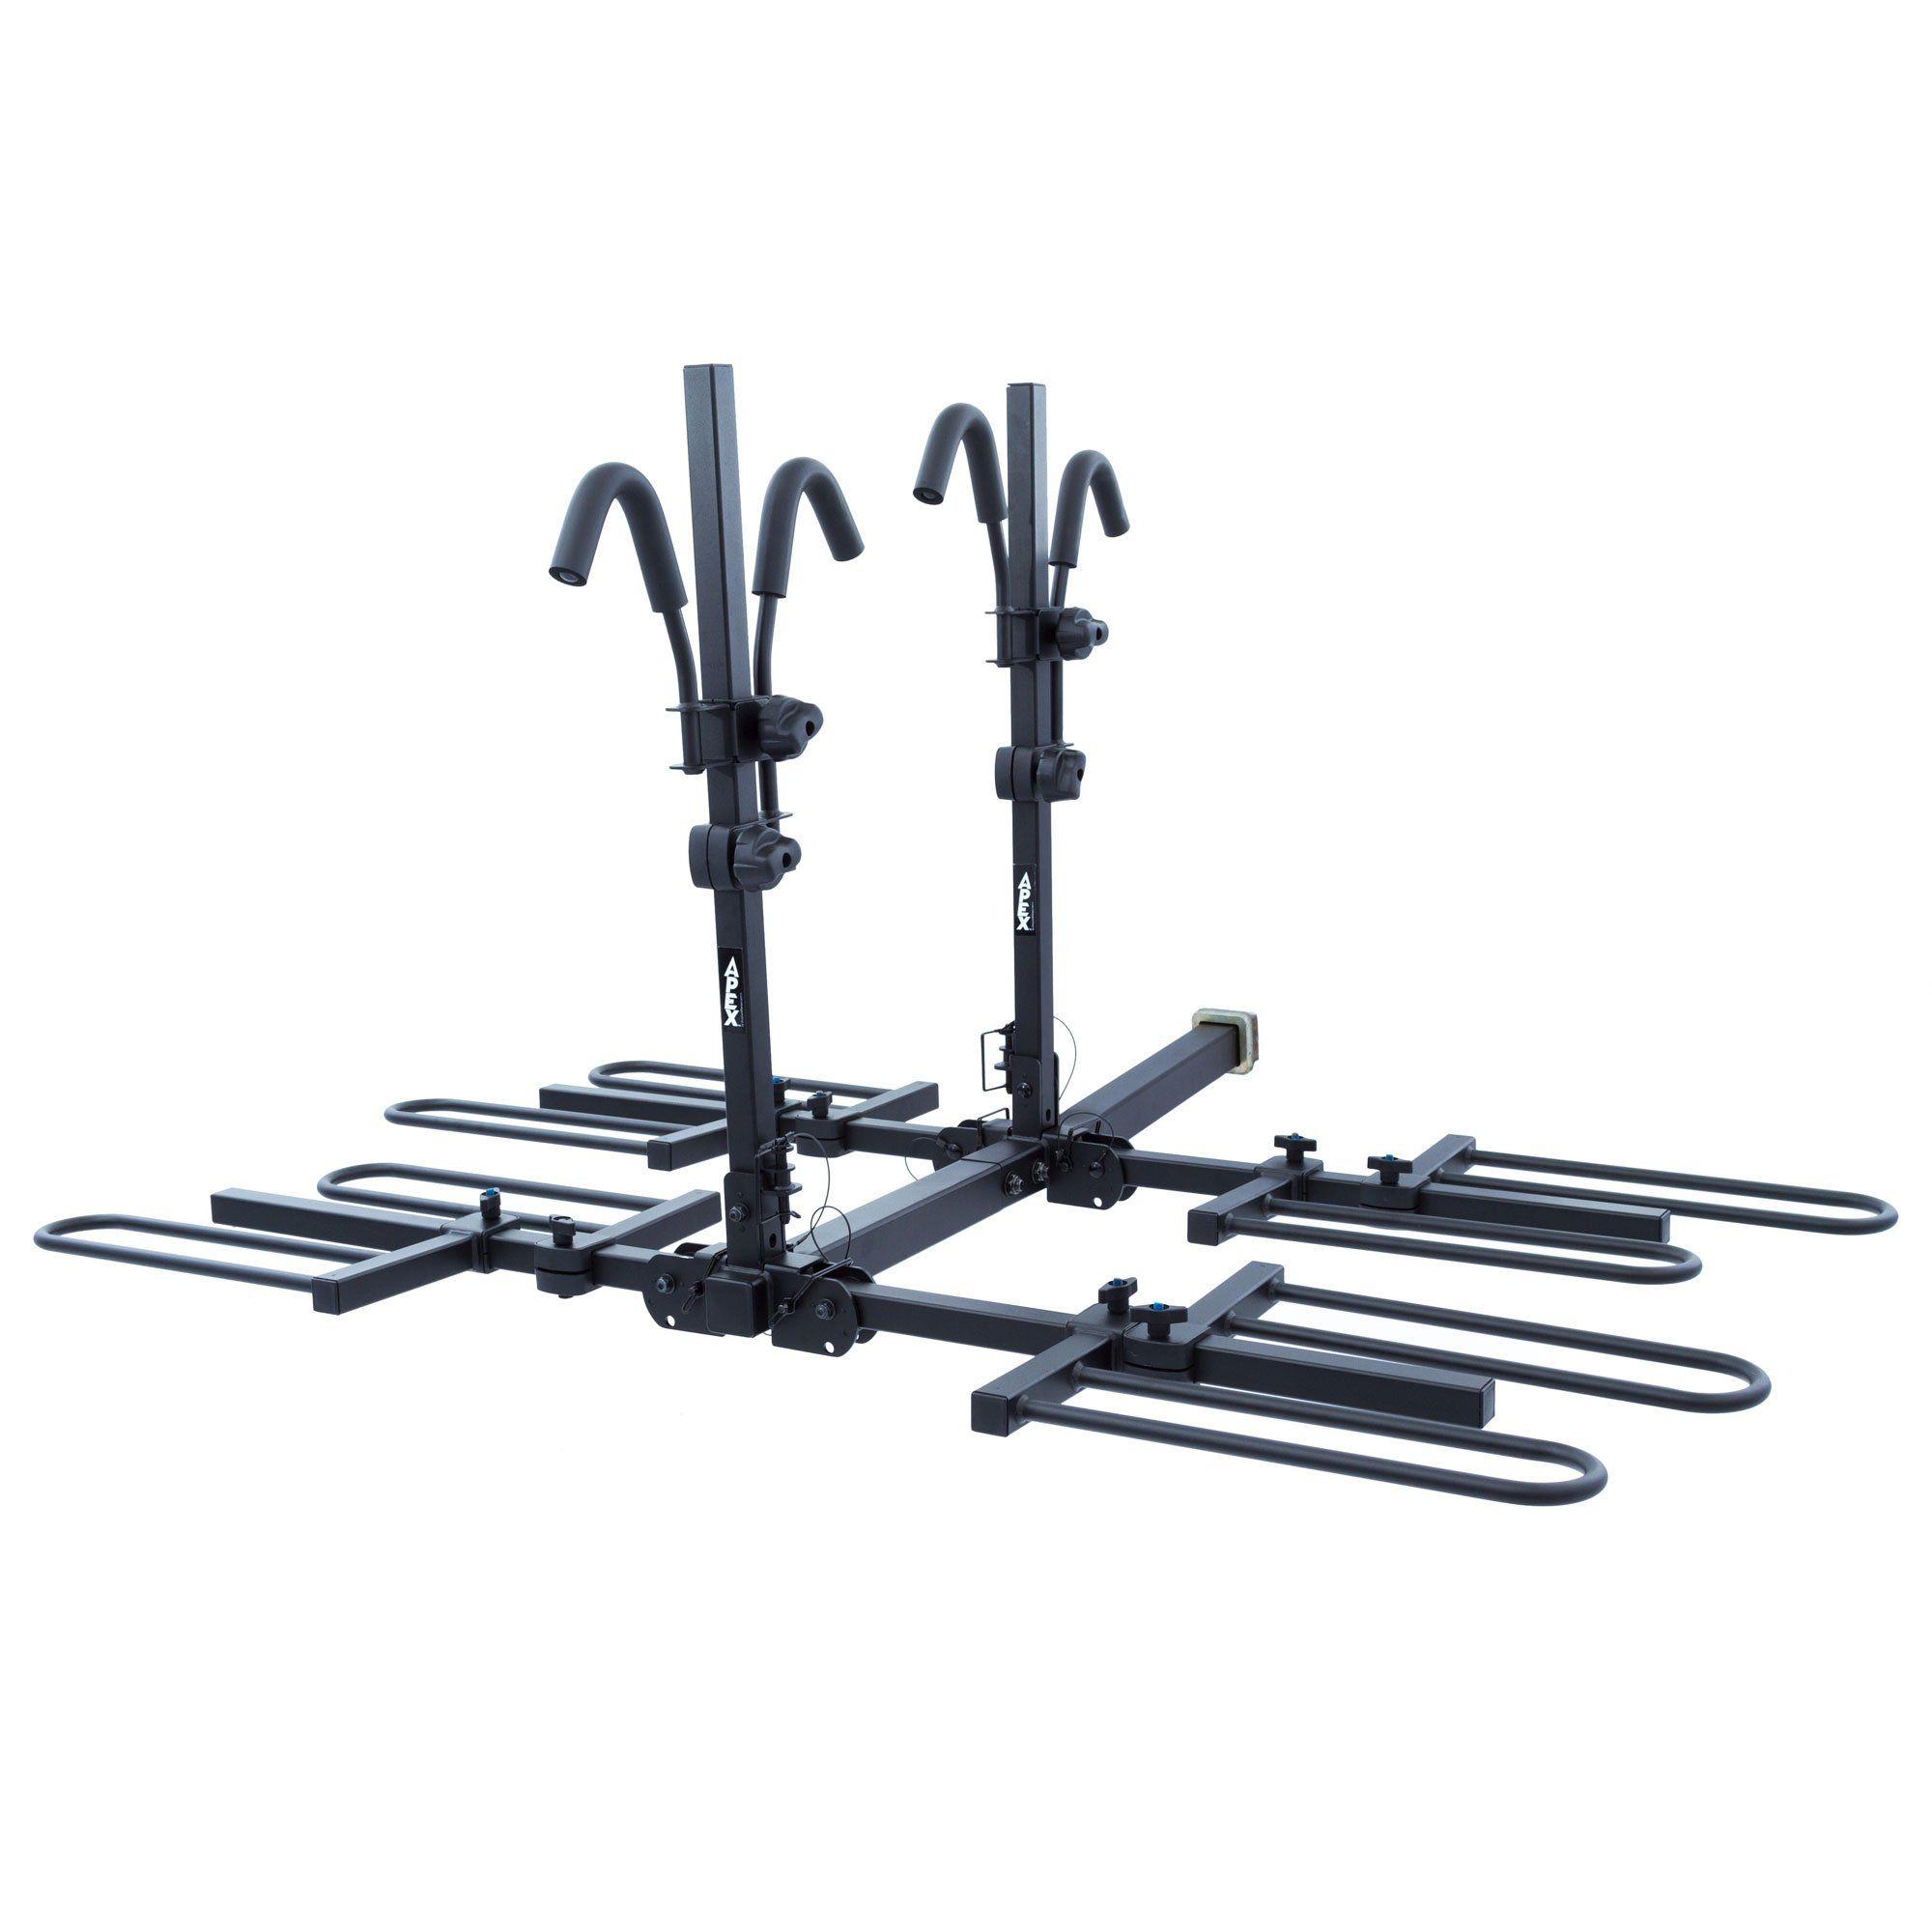 free toys sportsrack advantage bike product overstock black today shipping elite sports rack glideaway steel